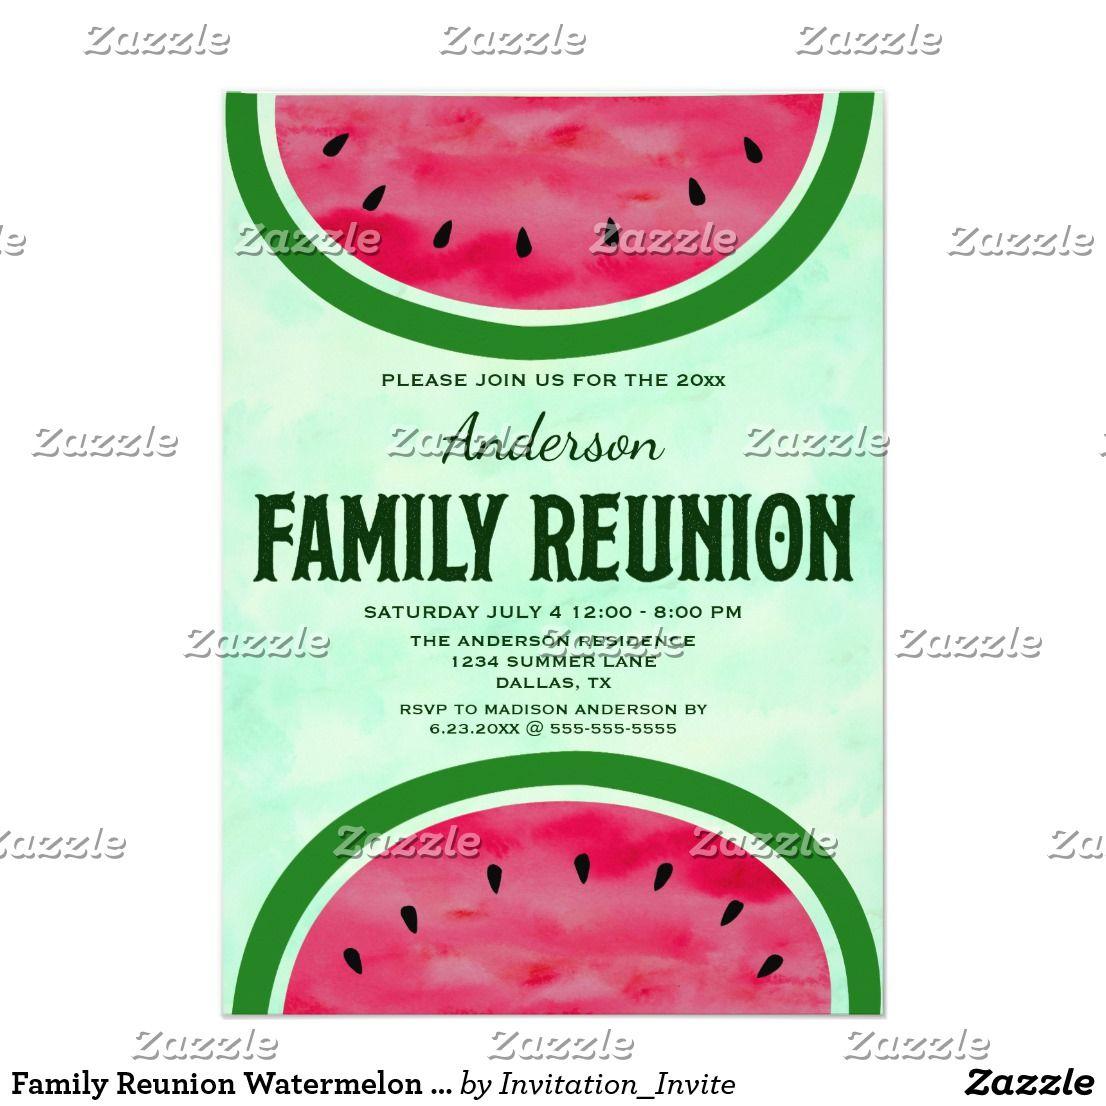 Family Reunion Watermelon Halves Invitation | Family reunions and ...